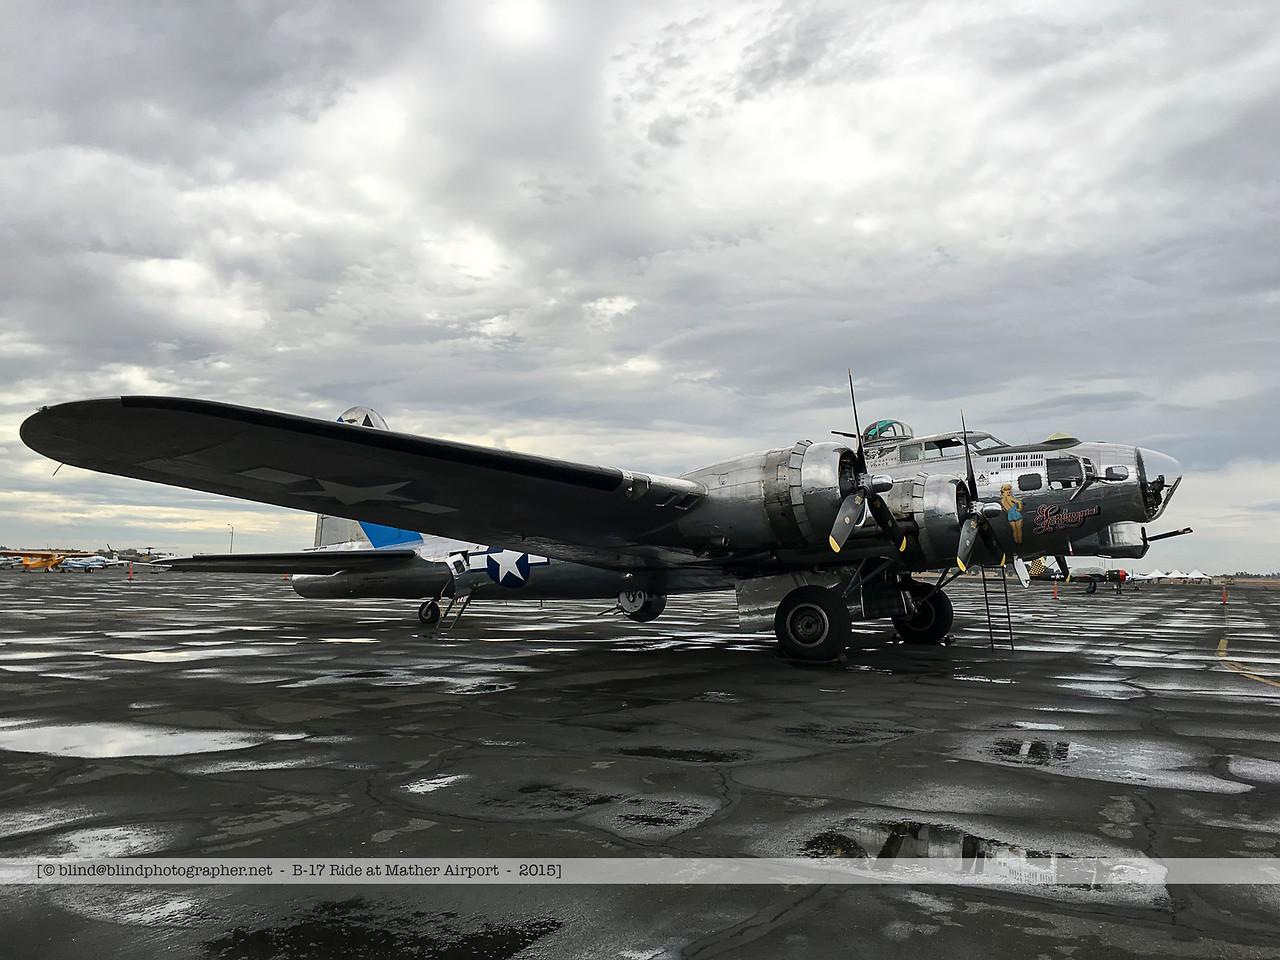 F20151001a103354_4732-B-17-Sentimental Journey-Mather Airport,Sacramento,California